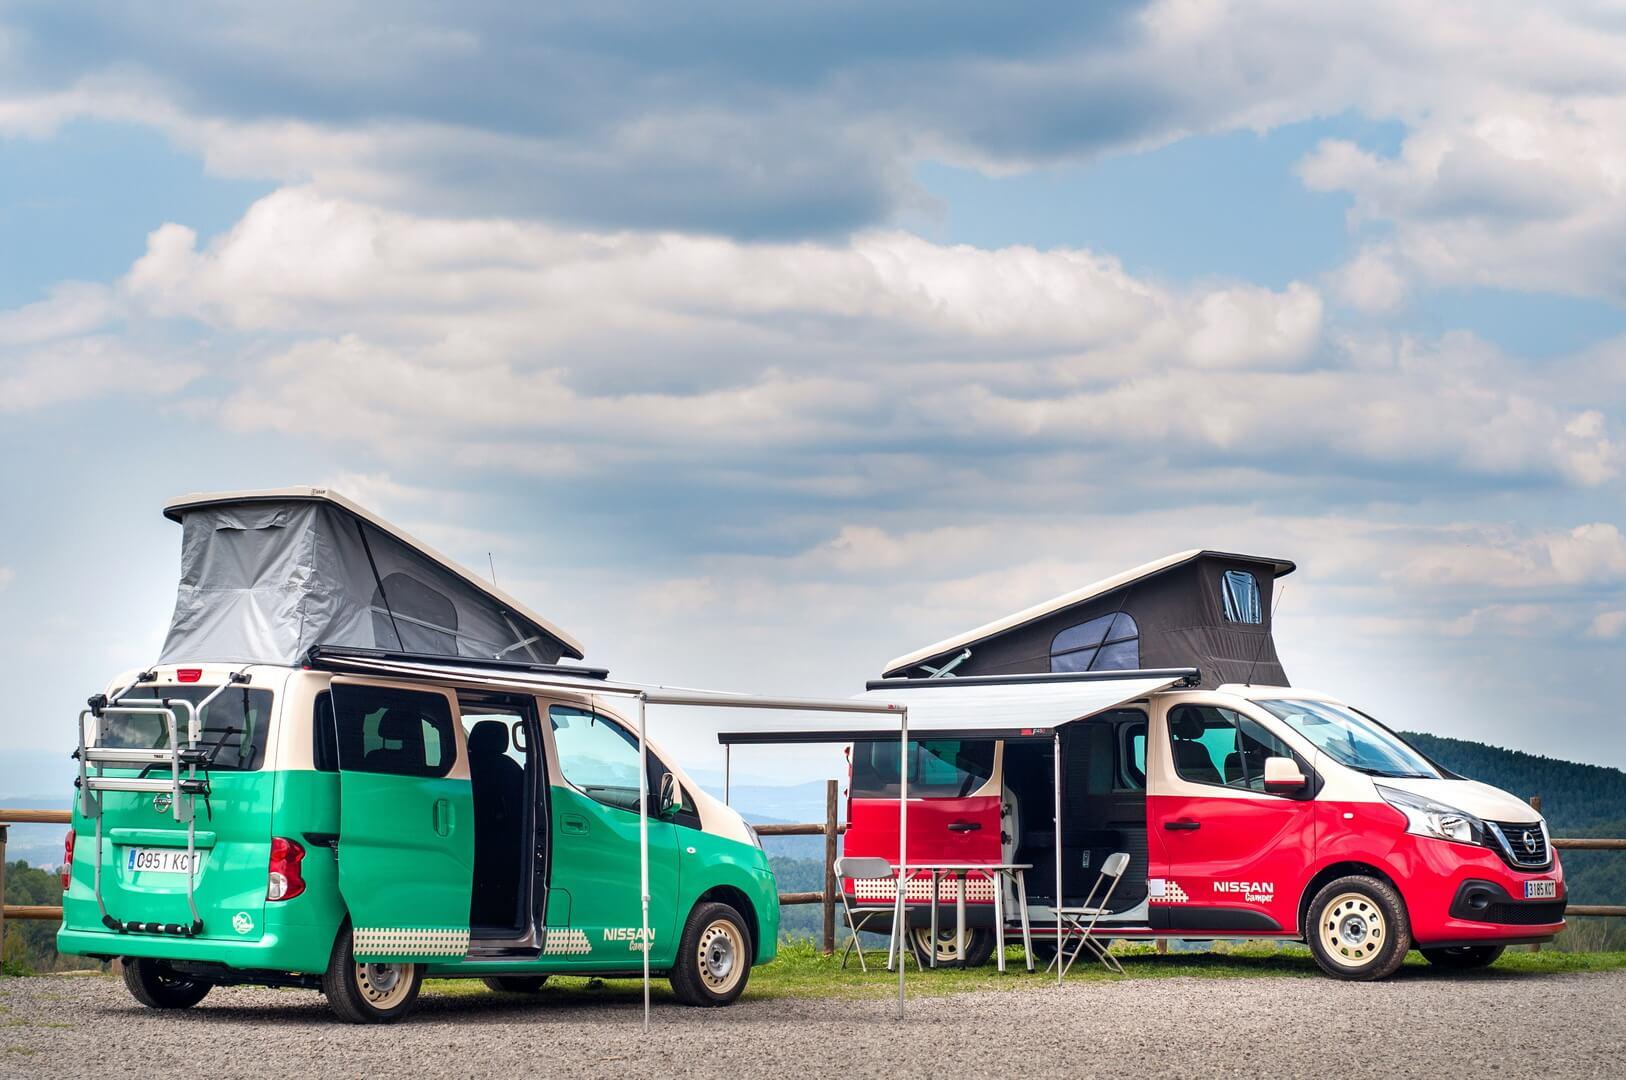 Полностью электрический Nissan e-NV200 Camper и Nissan NV300 Camper